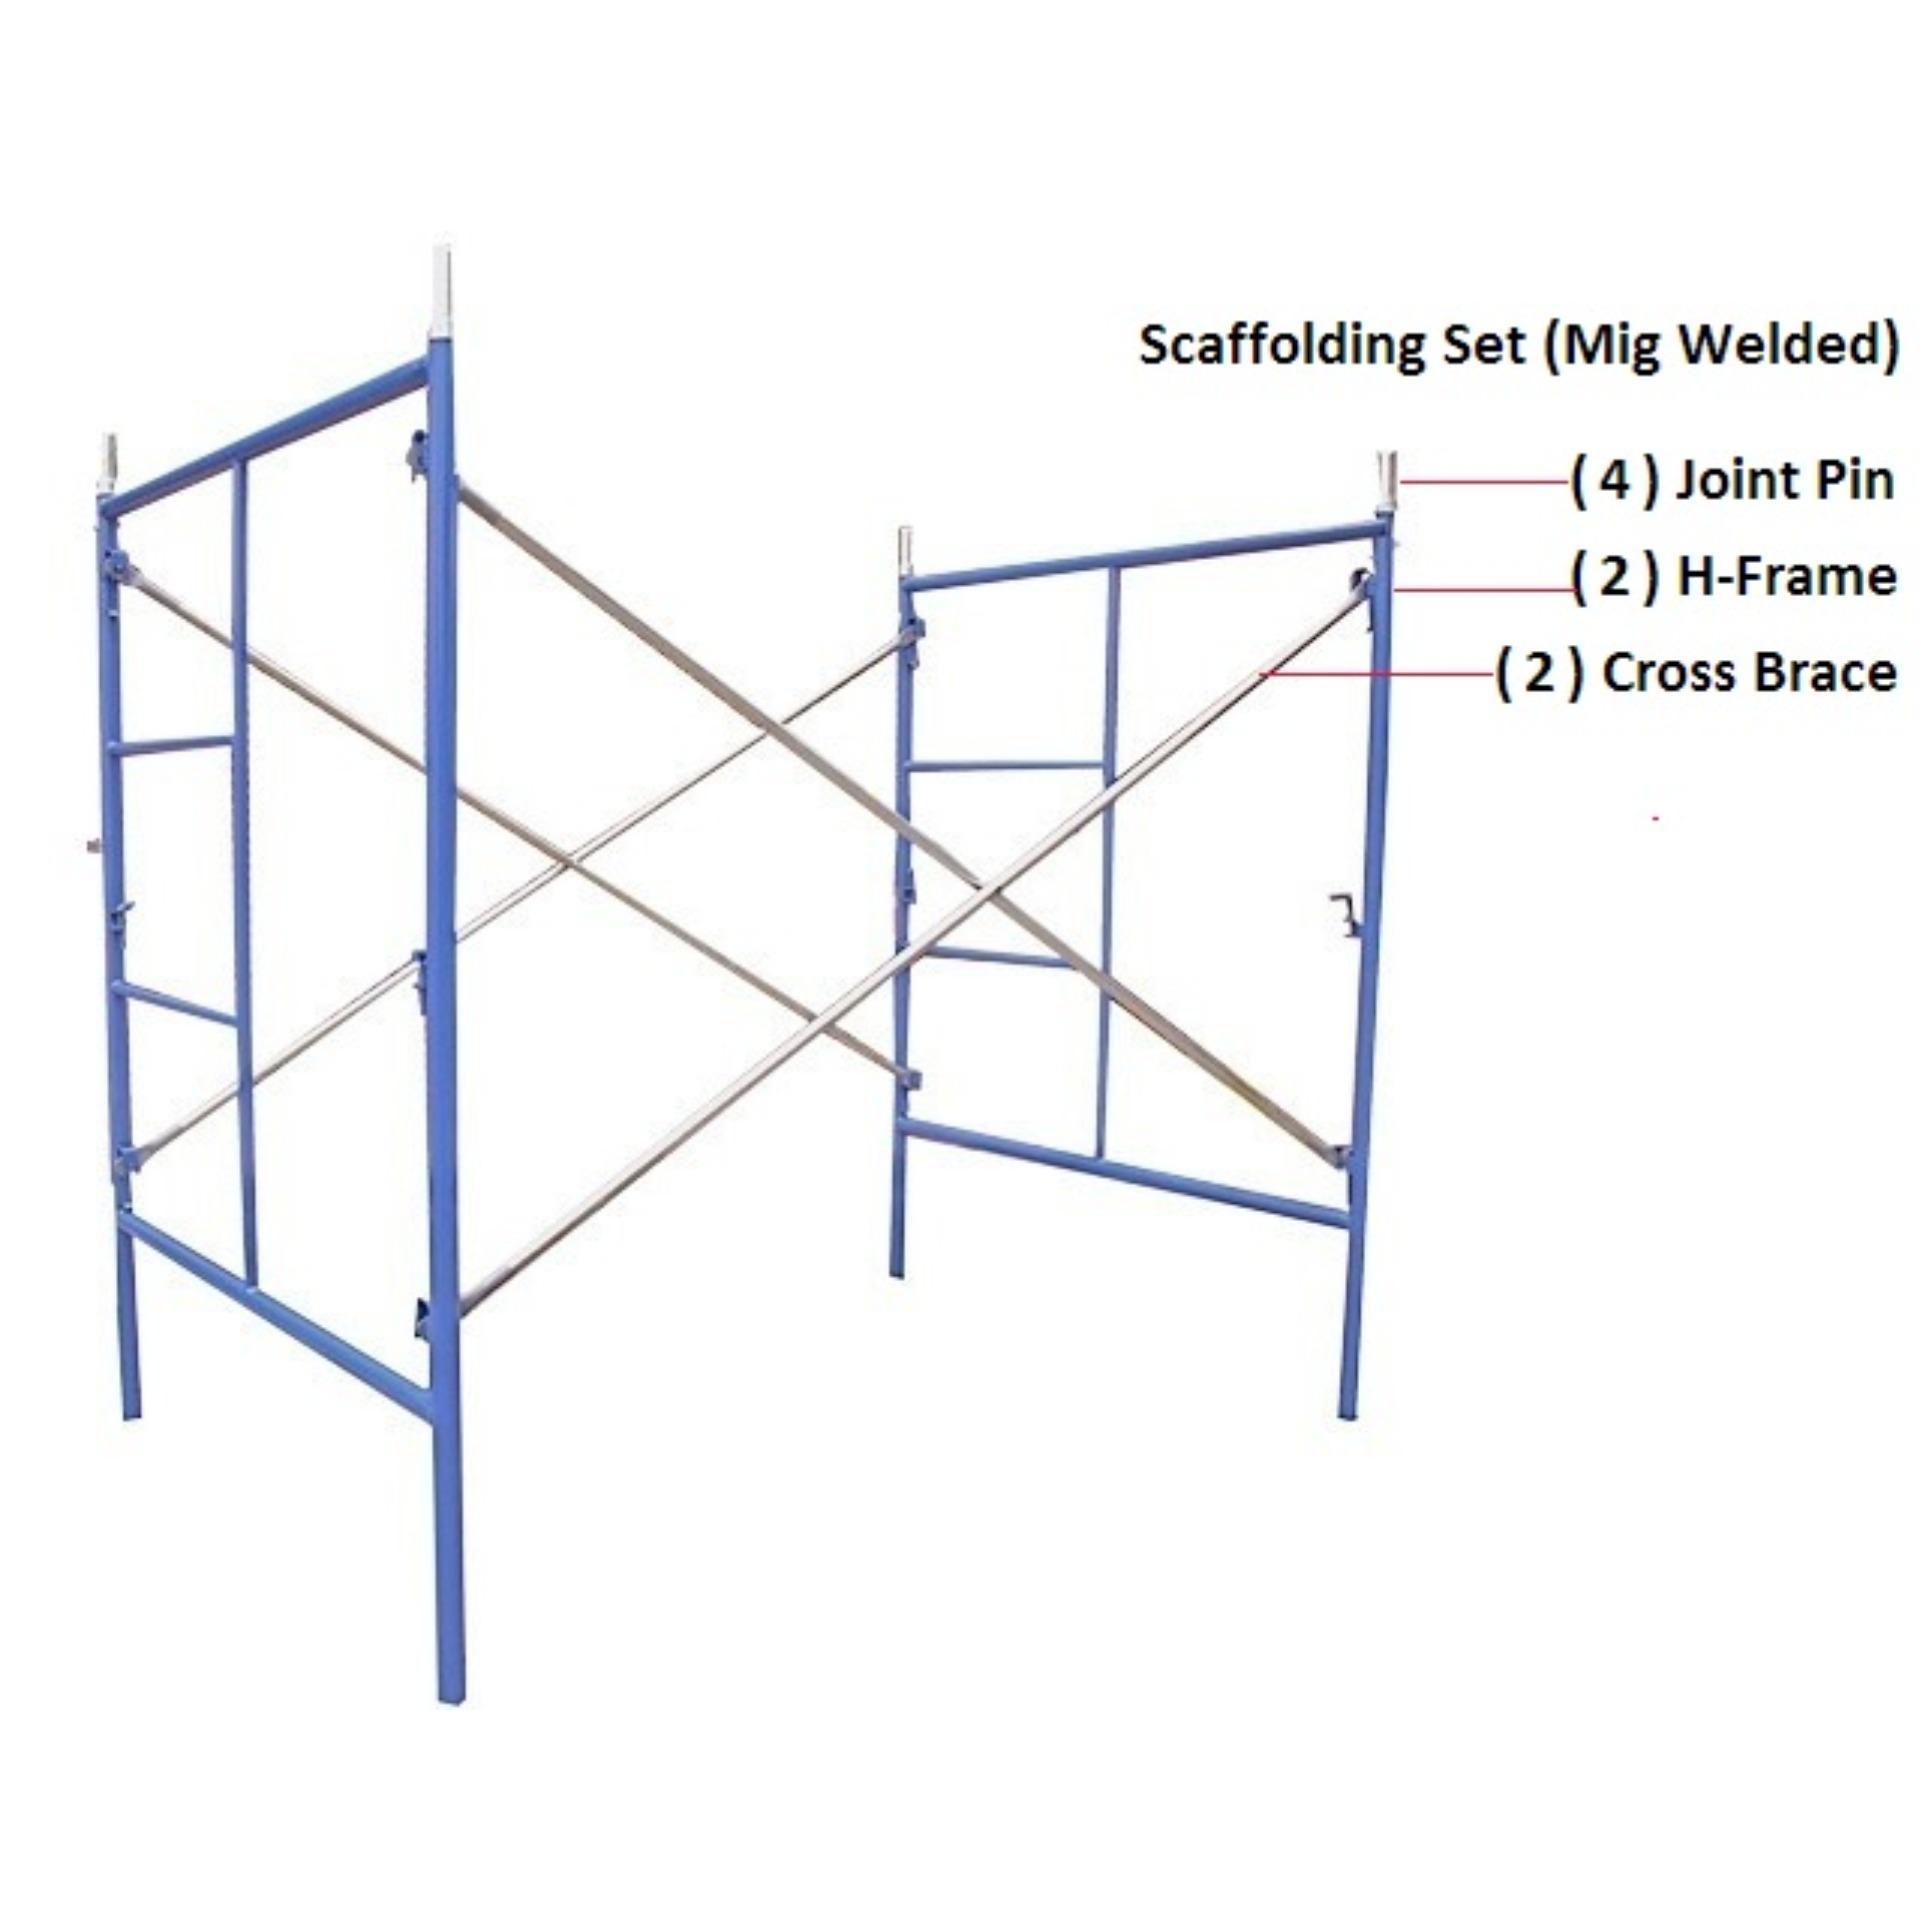 hight resolution of scaffolding set